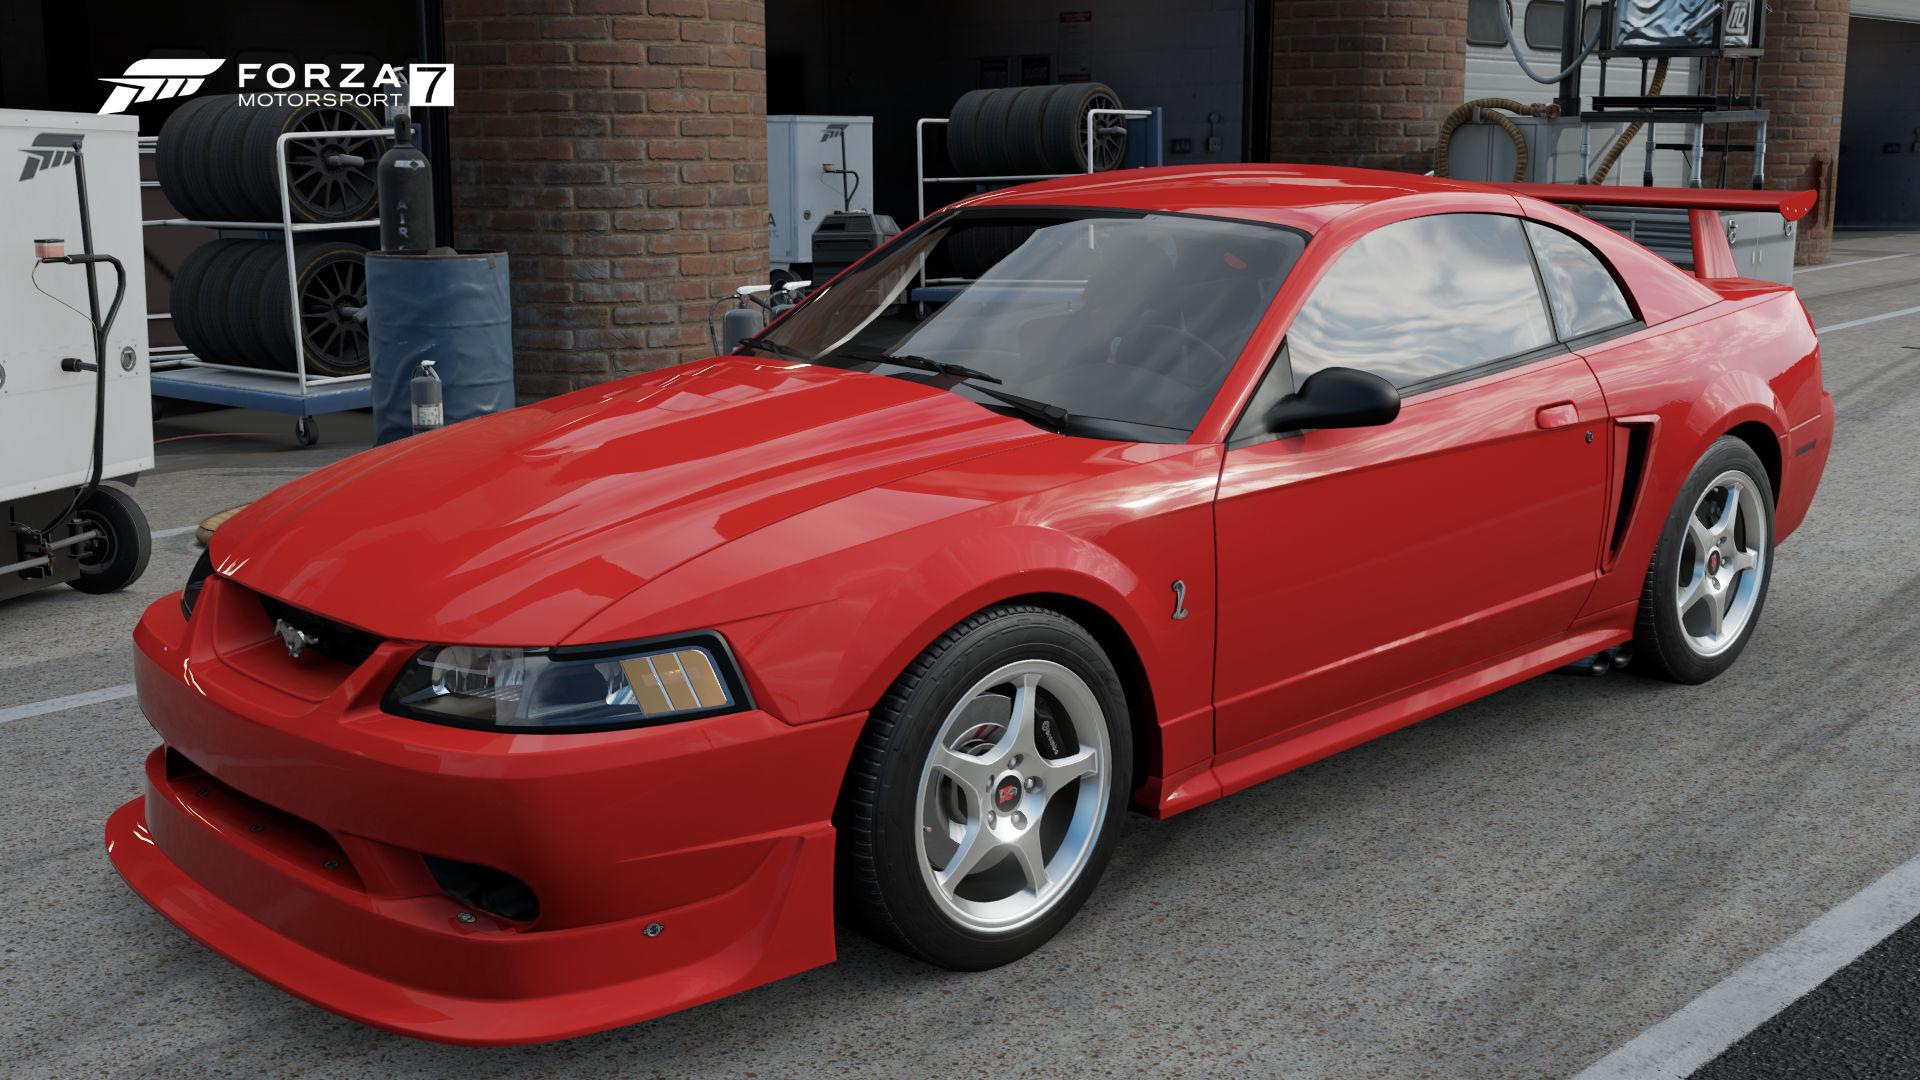 Ford Mustang Fourth Generation Wikipedia >> Ford Svt Cobra R 2000 Forza Motorsport Wiki Fandom